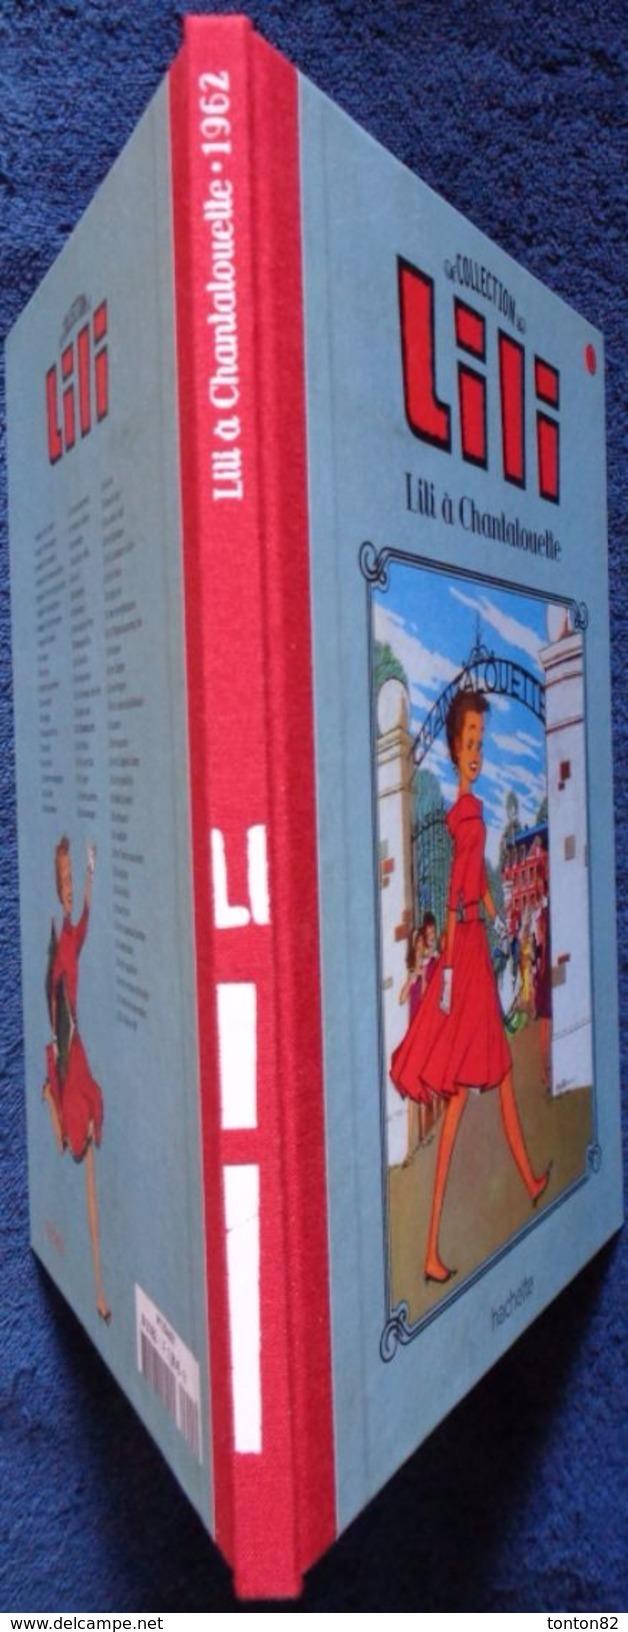 "La Collection LILI "" - N° 1 - LILI à Chantalouette - Album Hachette - ( 2015 ) . - Lili L'Espiègle"